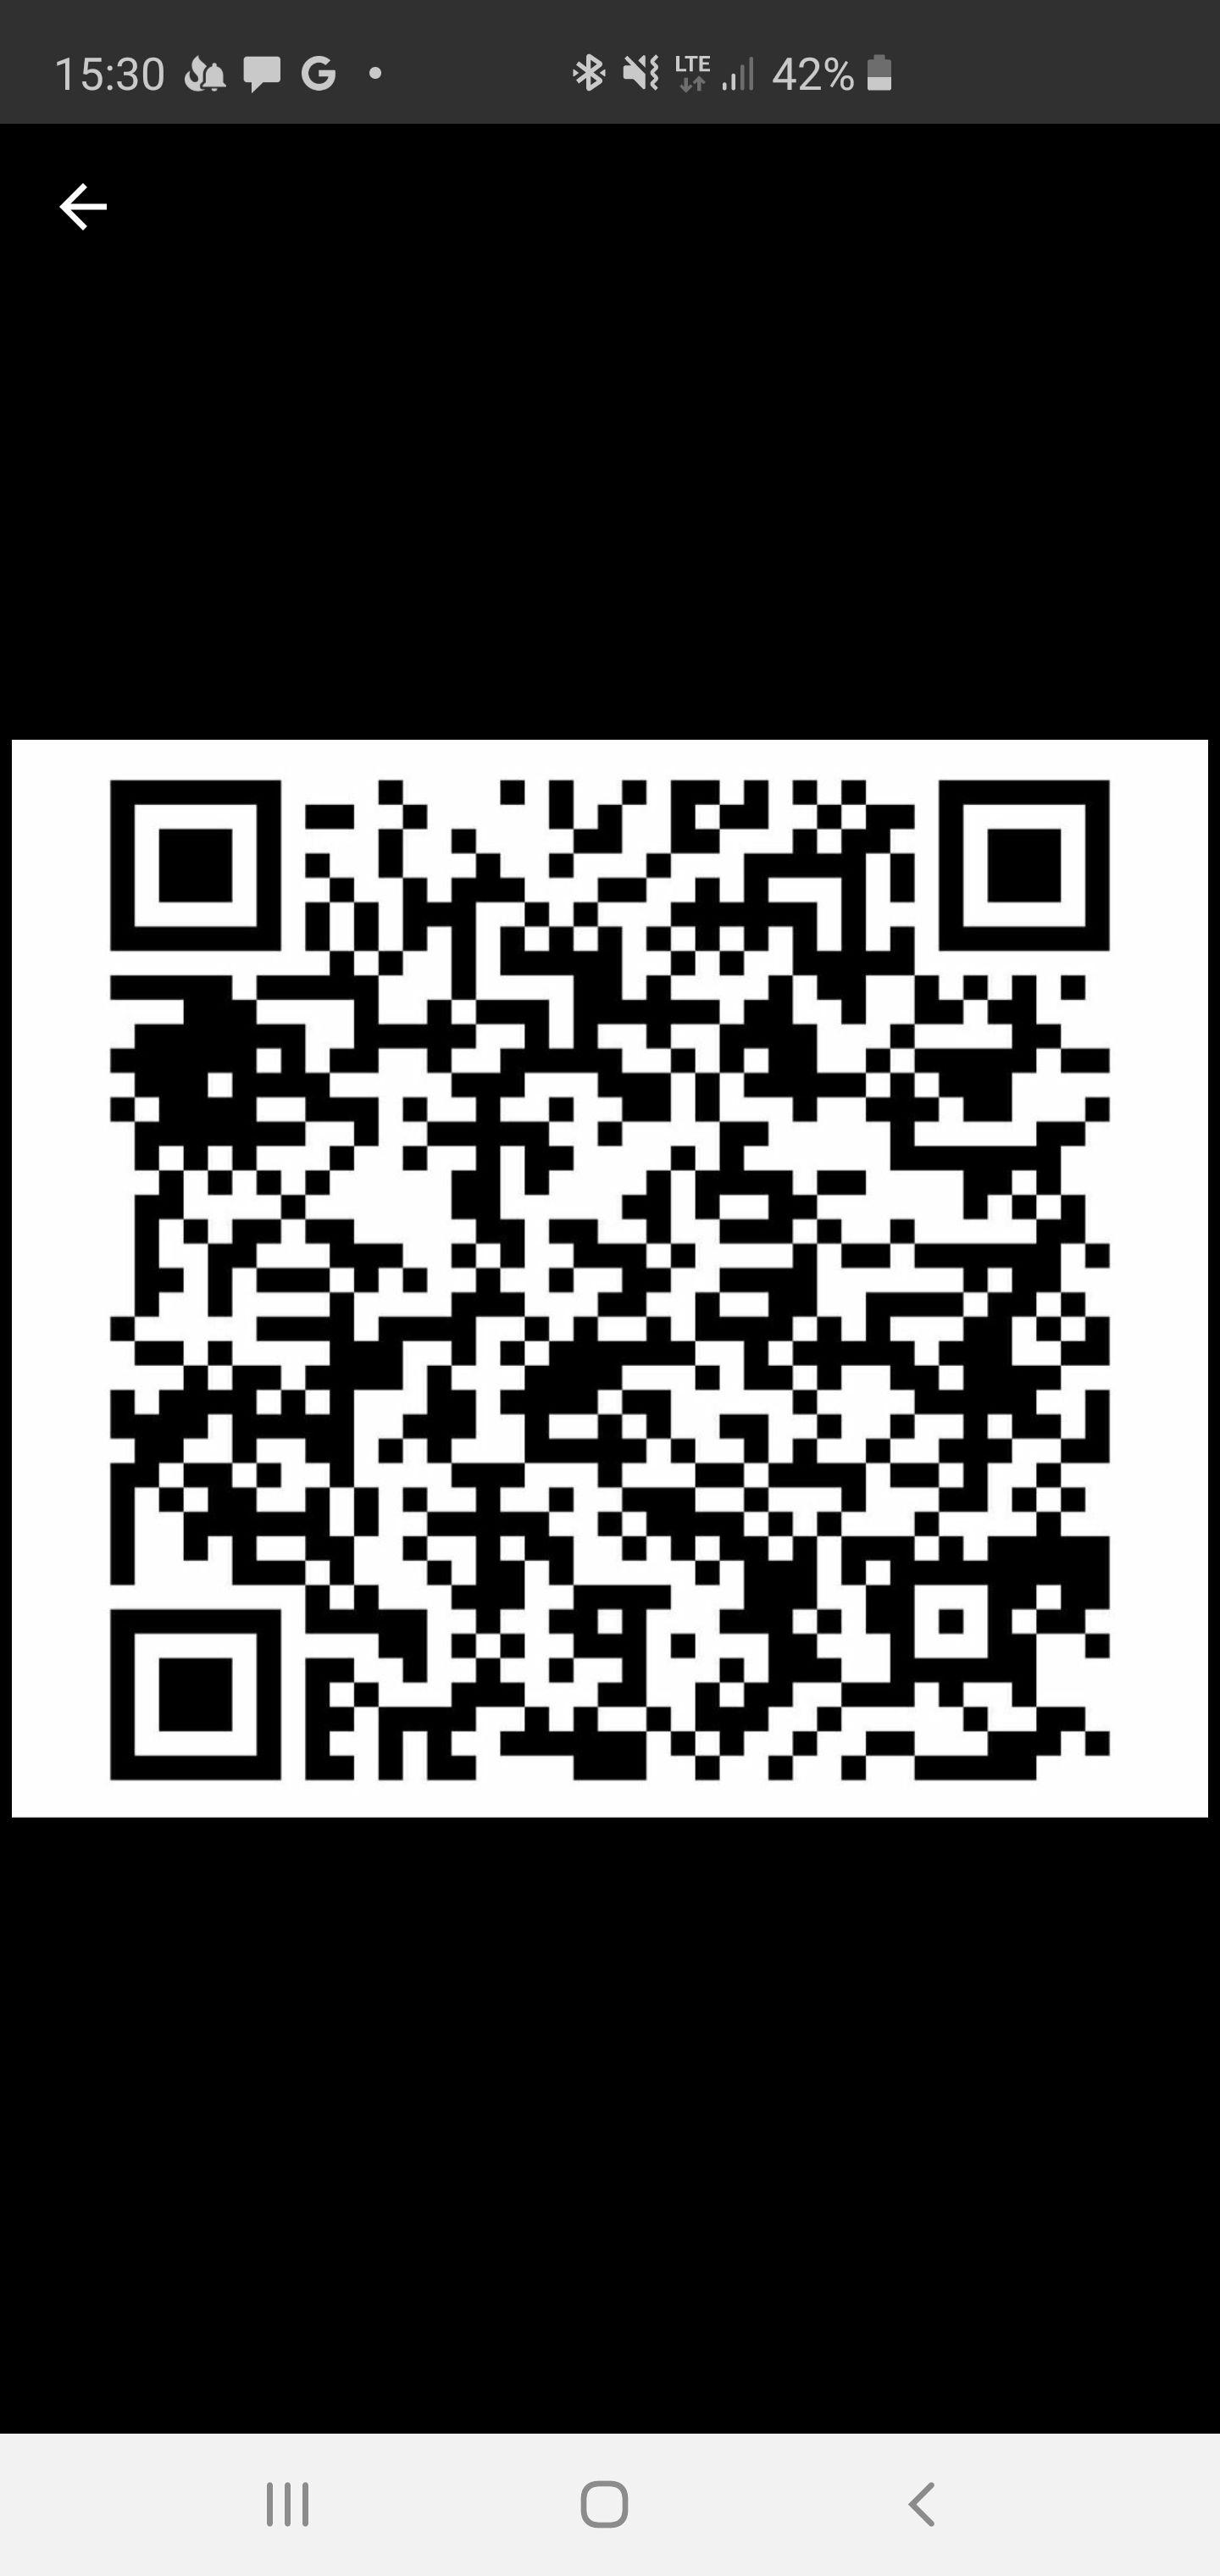 13696-RA0b2.jpg